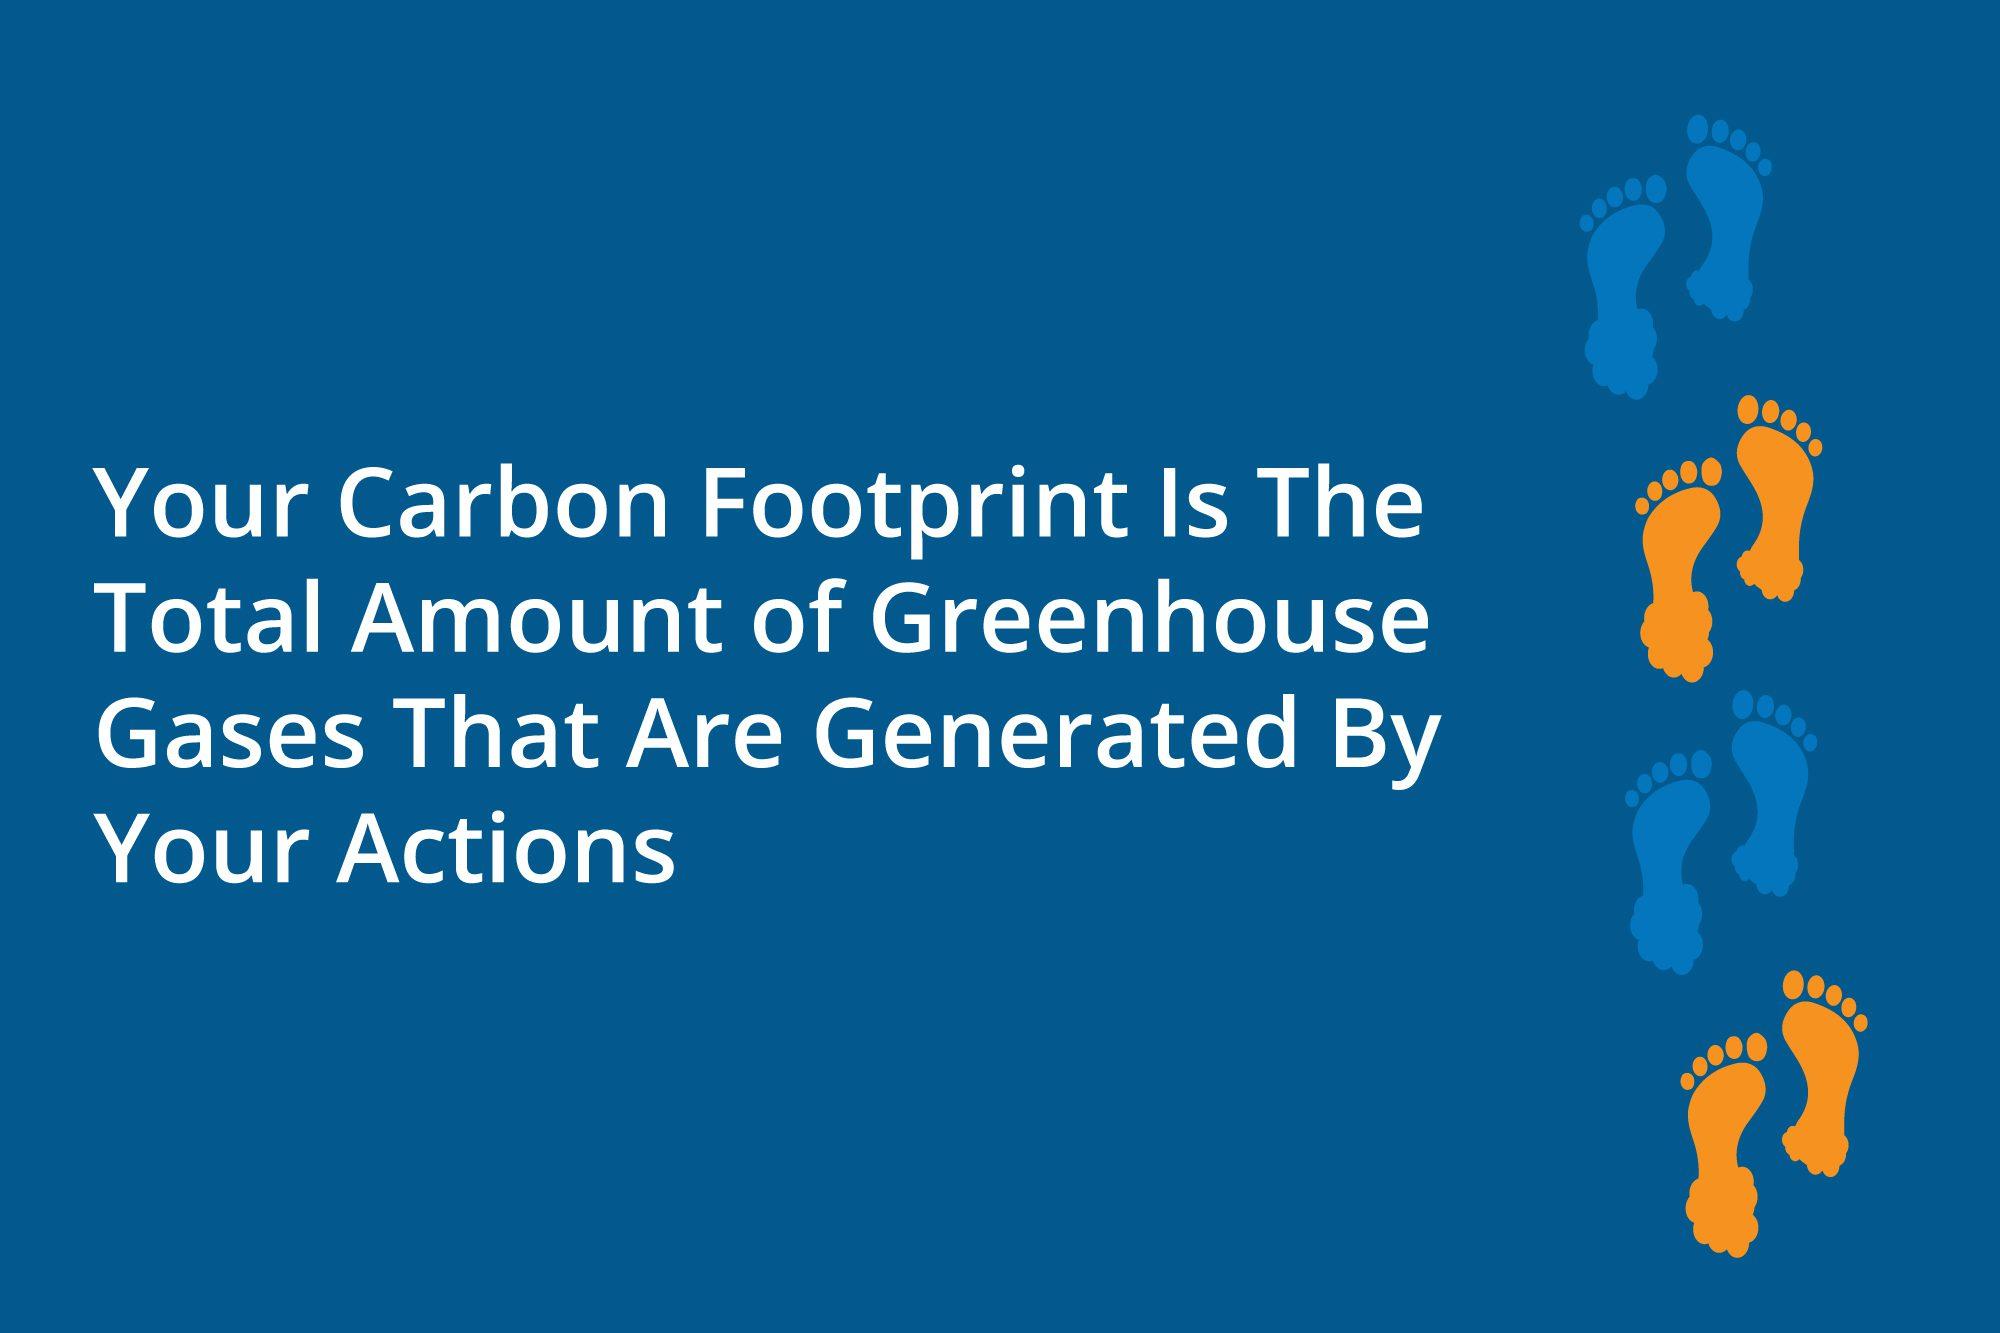 Infographic regarding carbon footprints